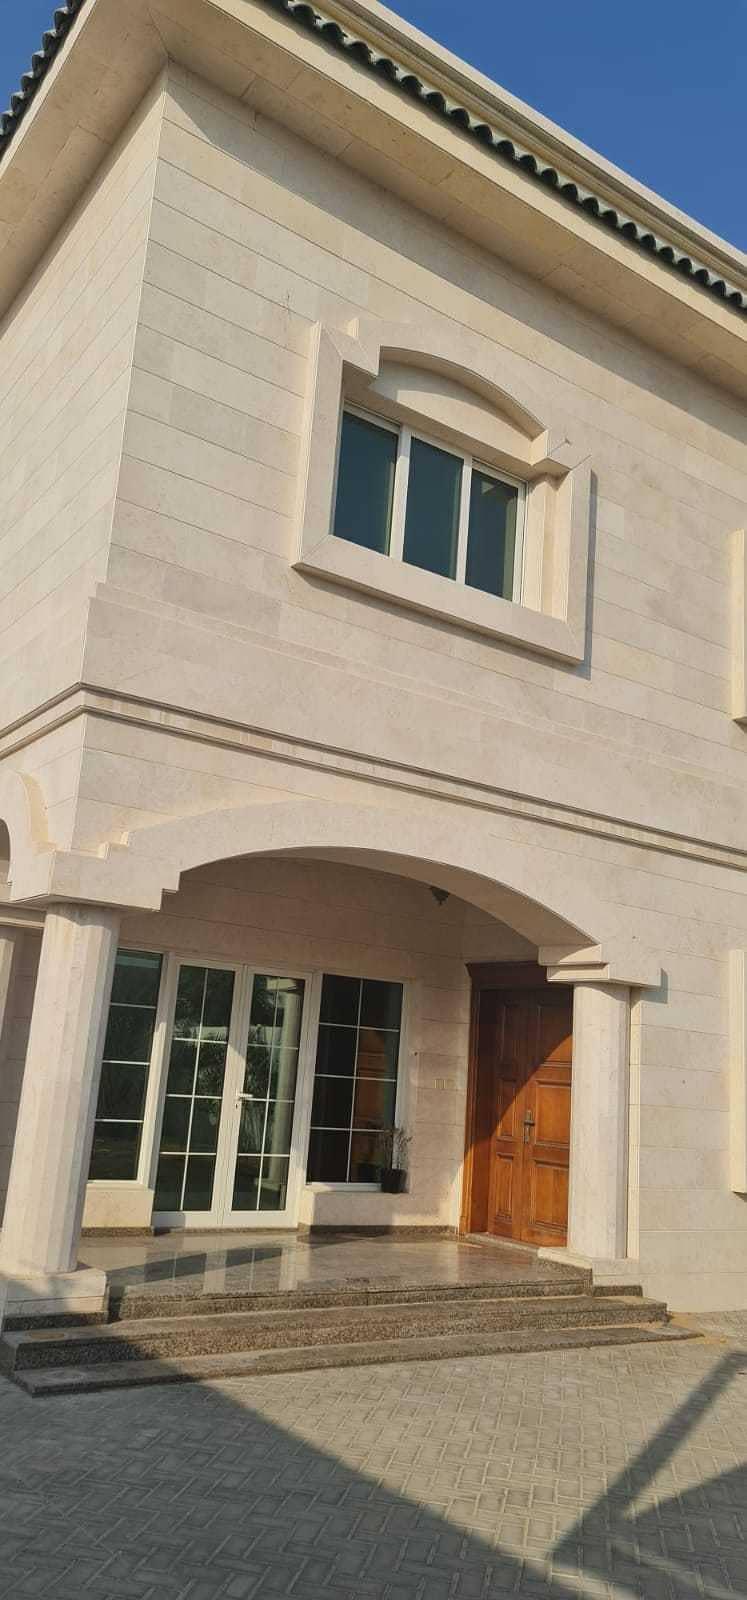 *** Enticing Offer- 5BHK Duplex Villa available in Al Goaz area ***